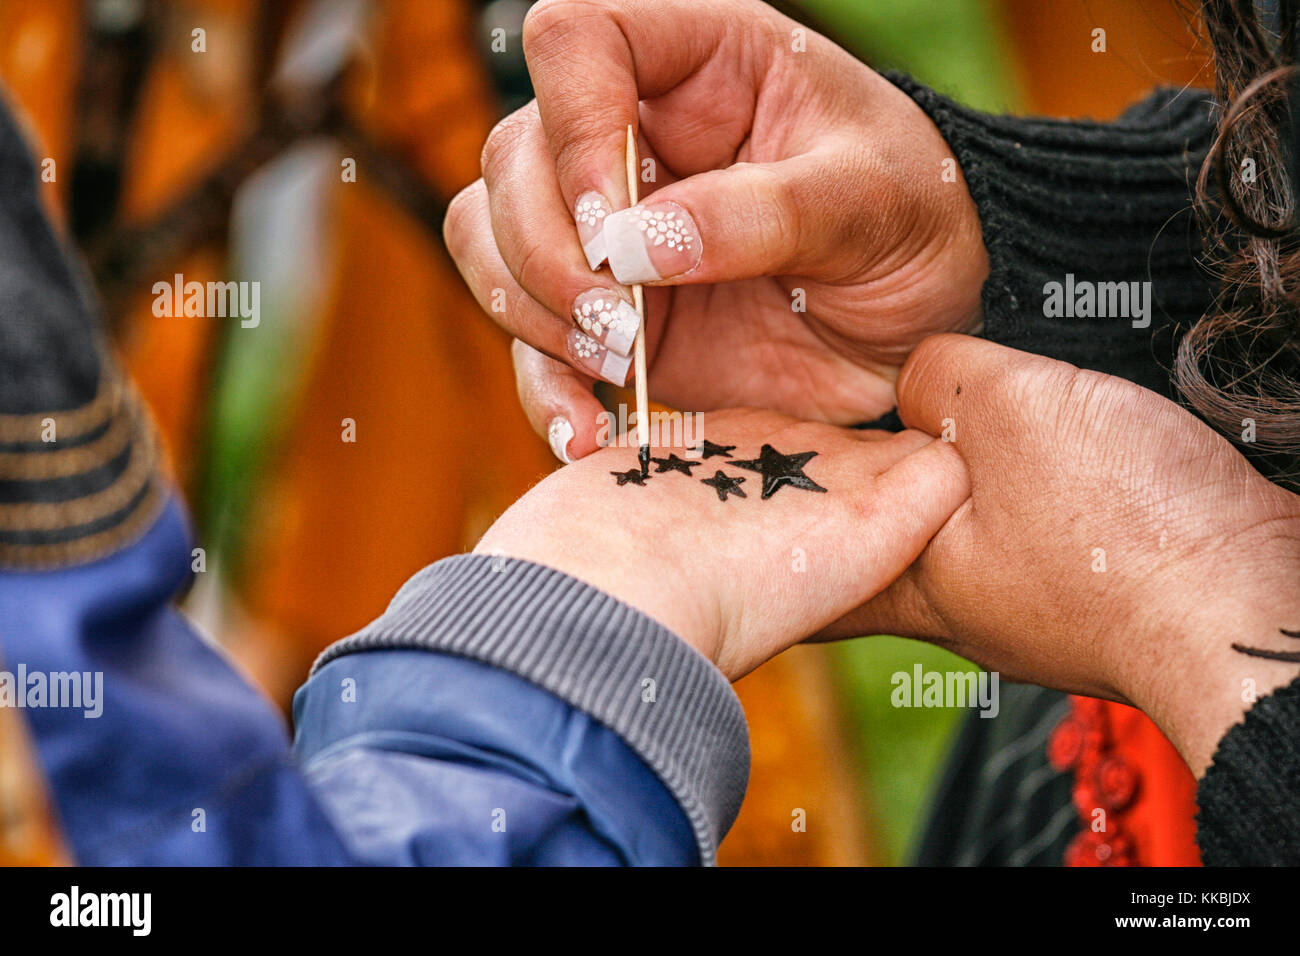 Long Nails Stock Photos & Long Nails Stock Images - Alamy